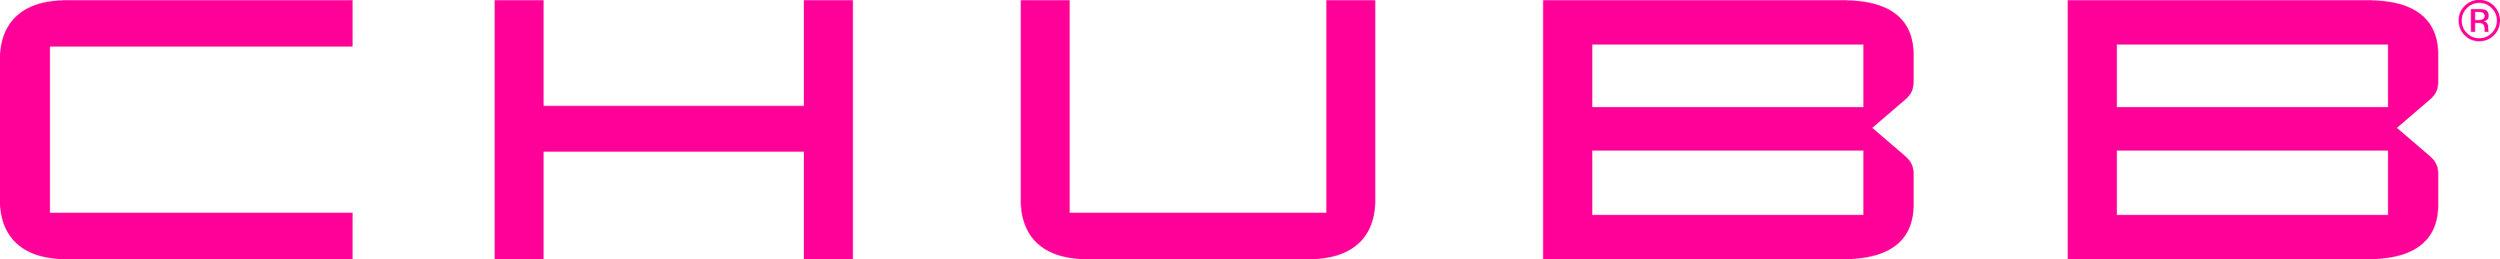 CHUBB_Logo_Magenta_JGB.jpg